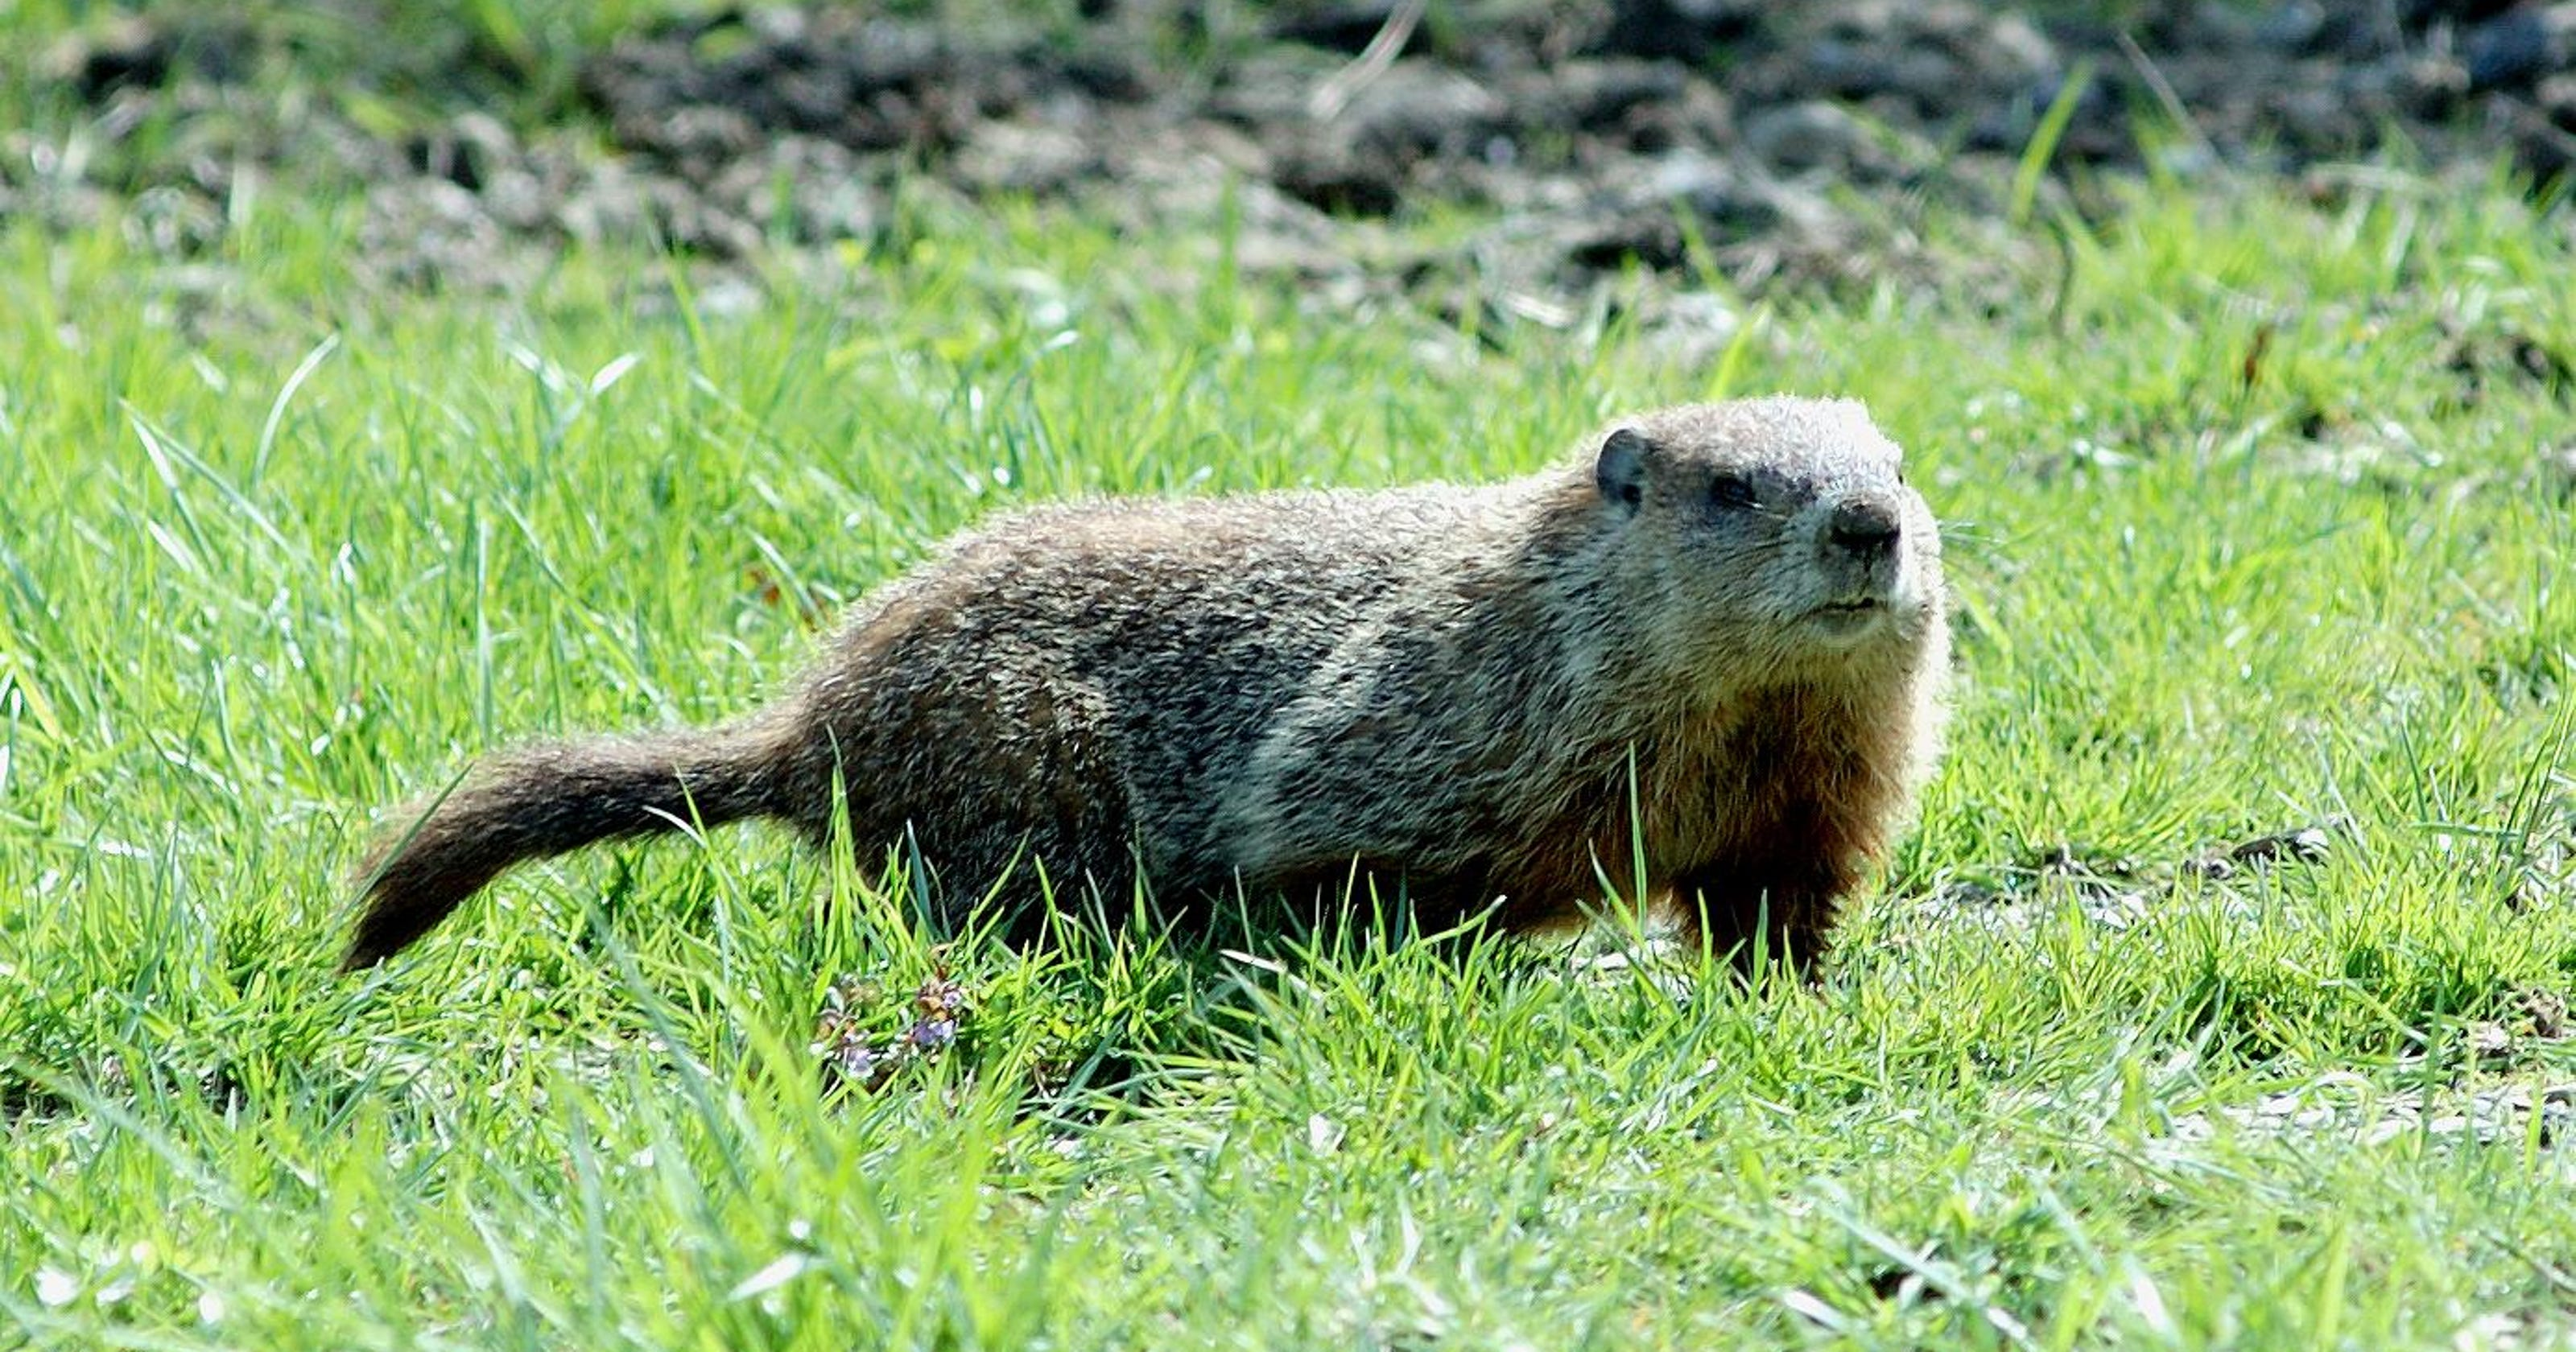 Species Spotlight: Woodchuck/Groundhogs